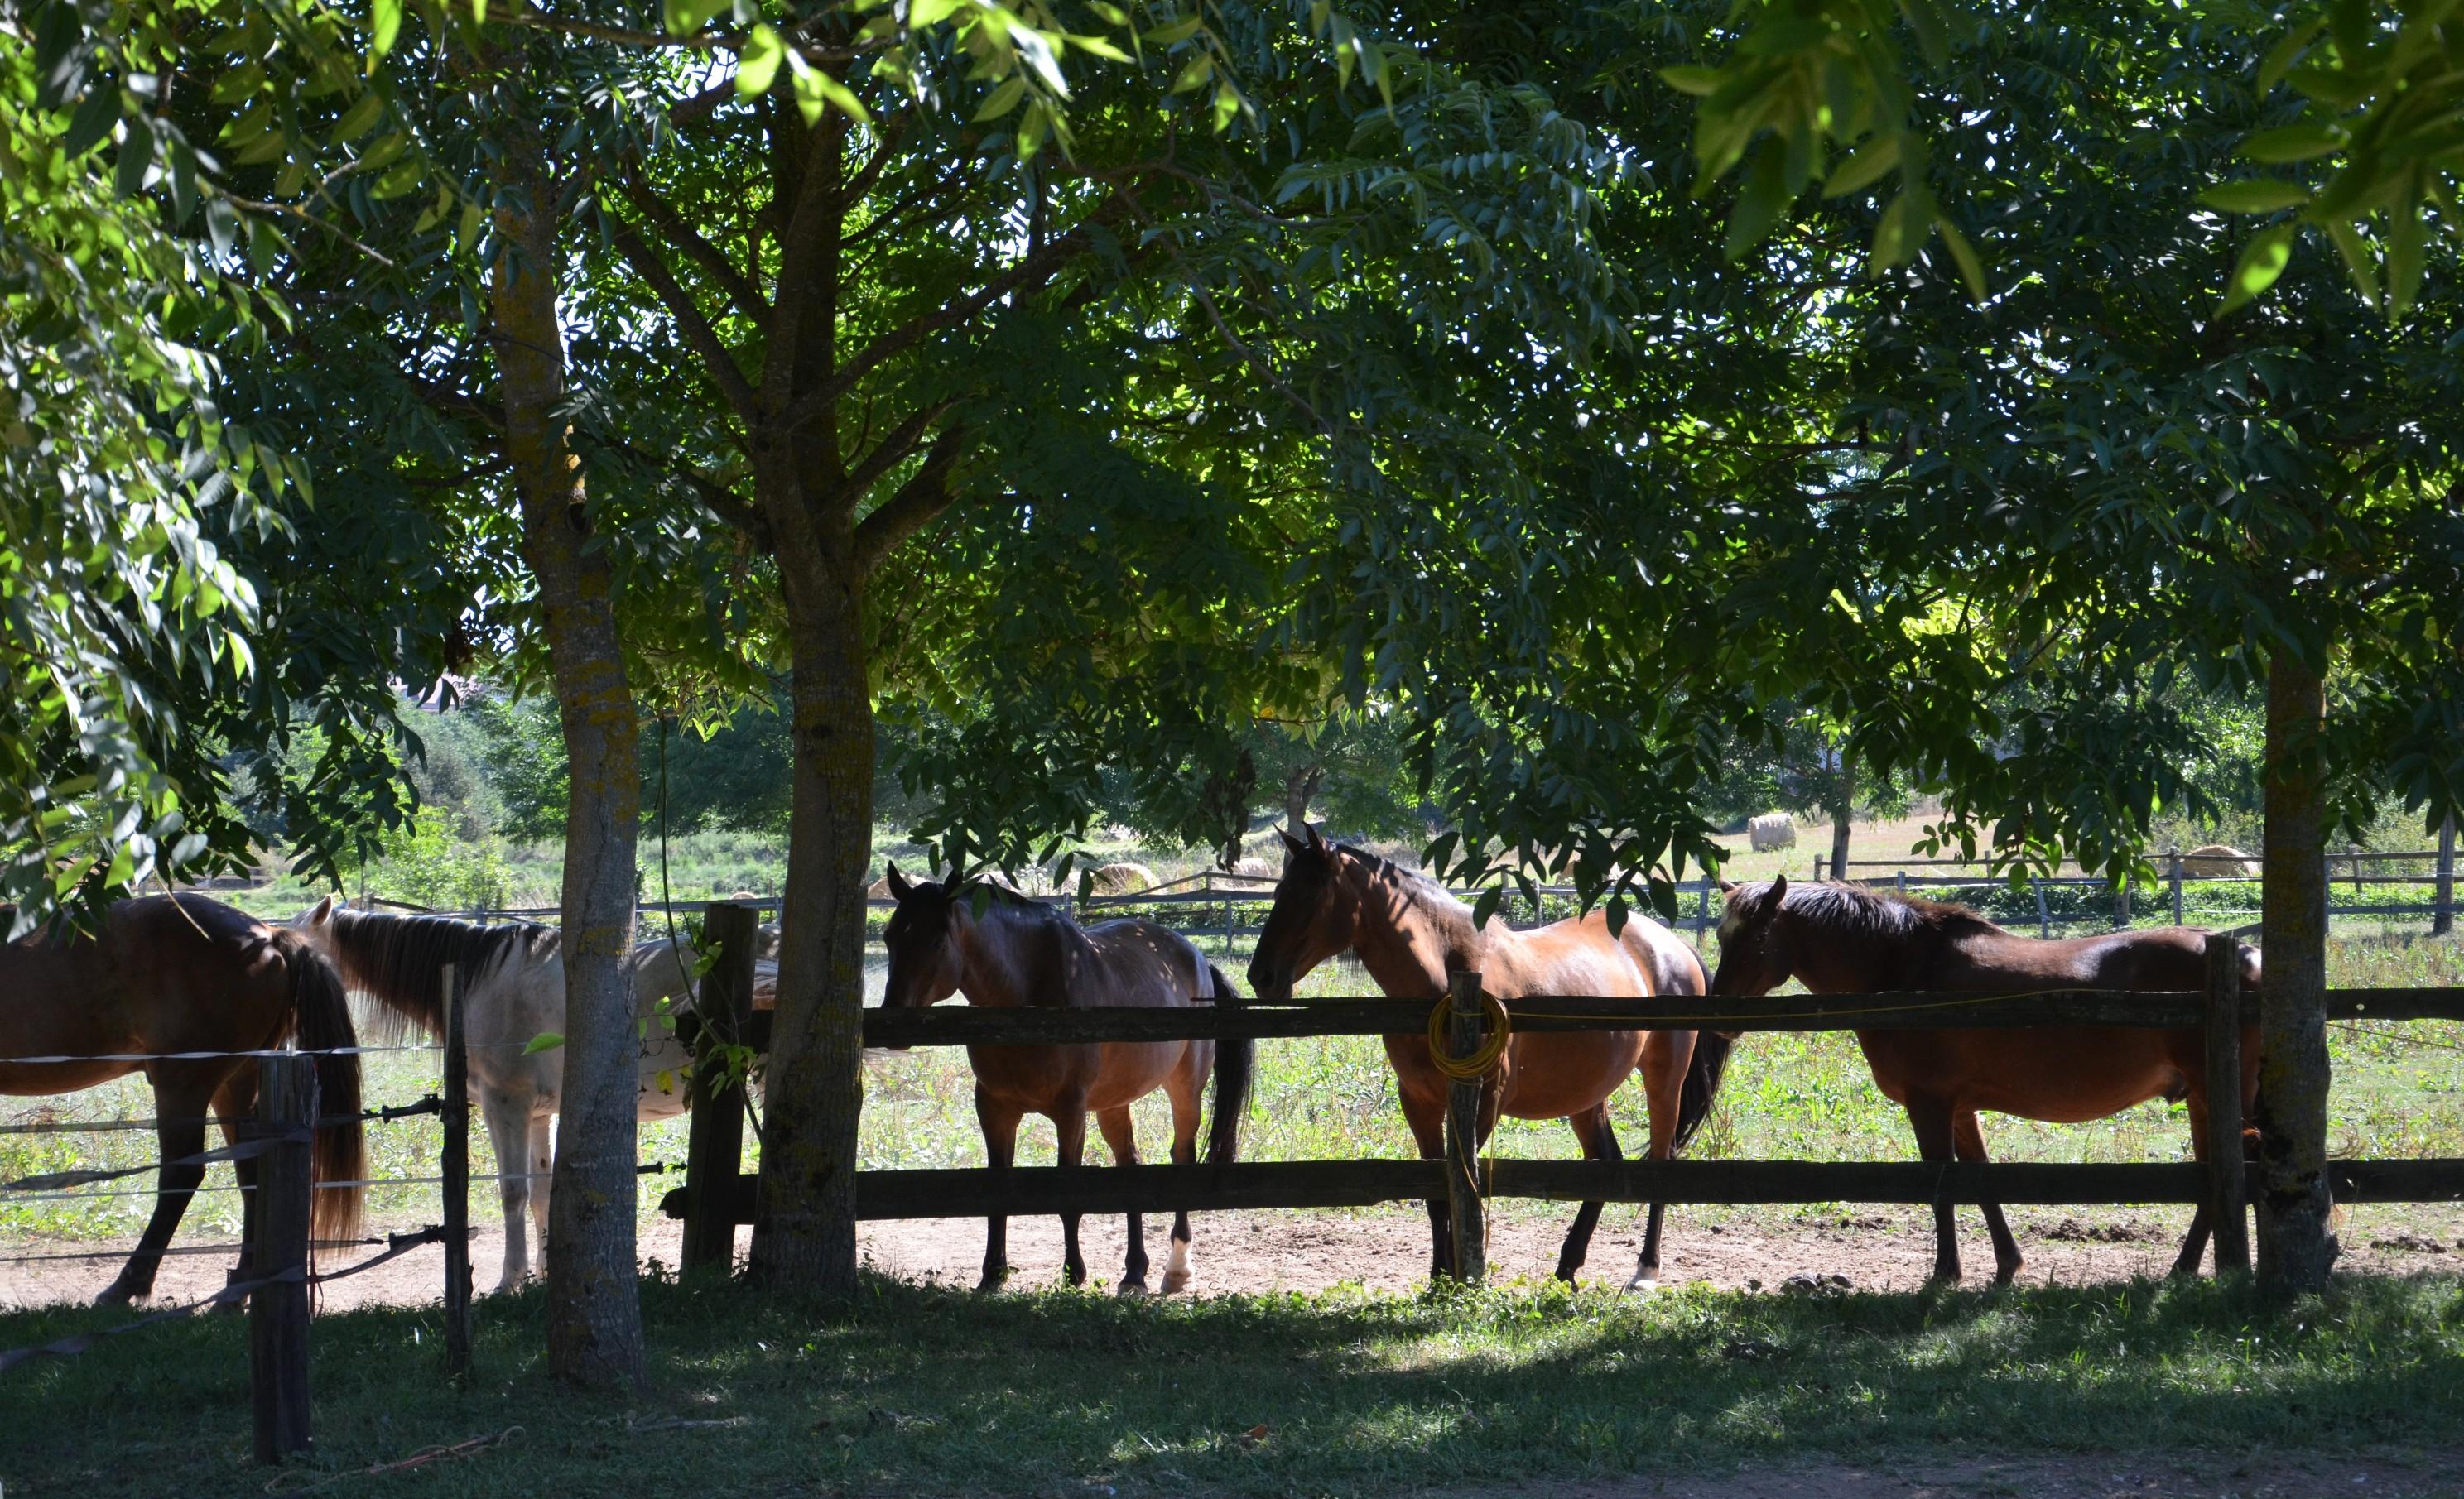 Ecuries de Seuzac paddock des chevaux